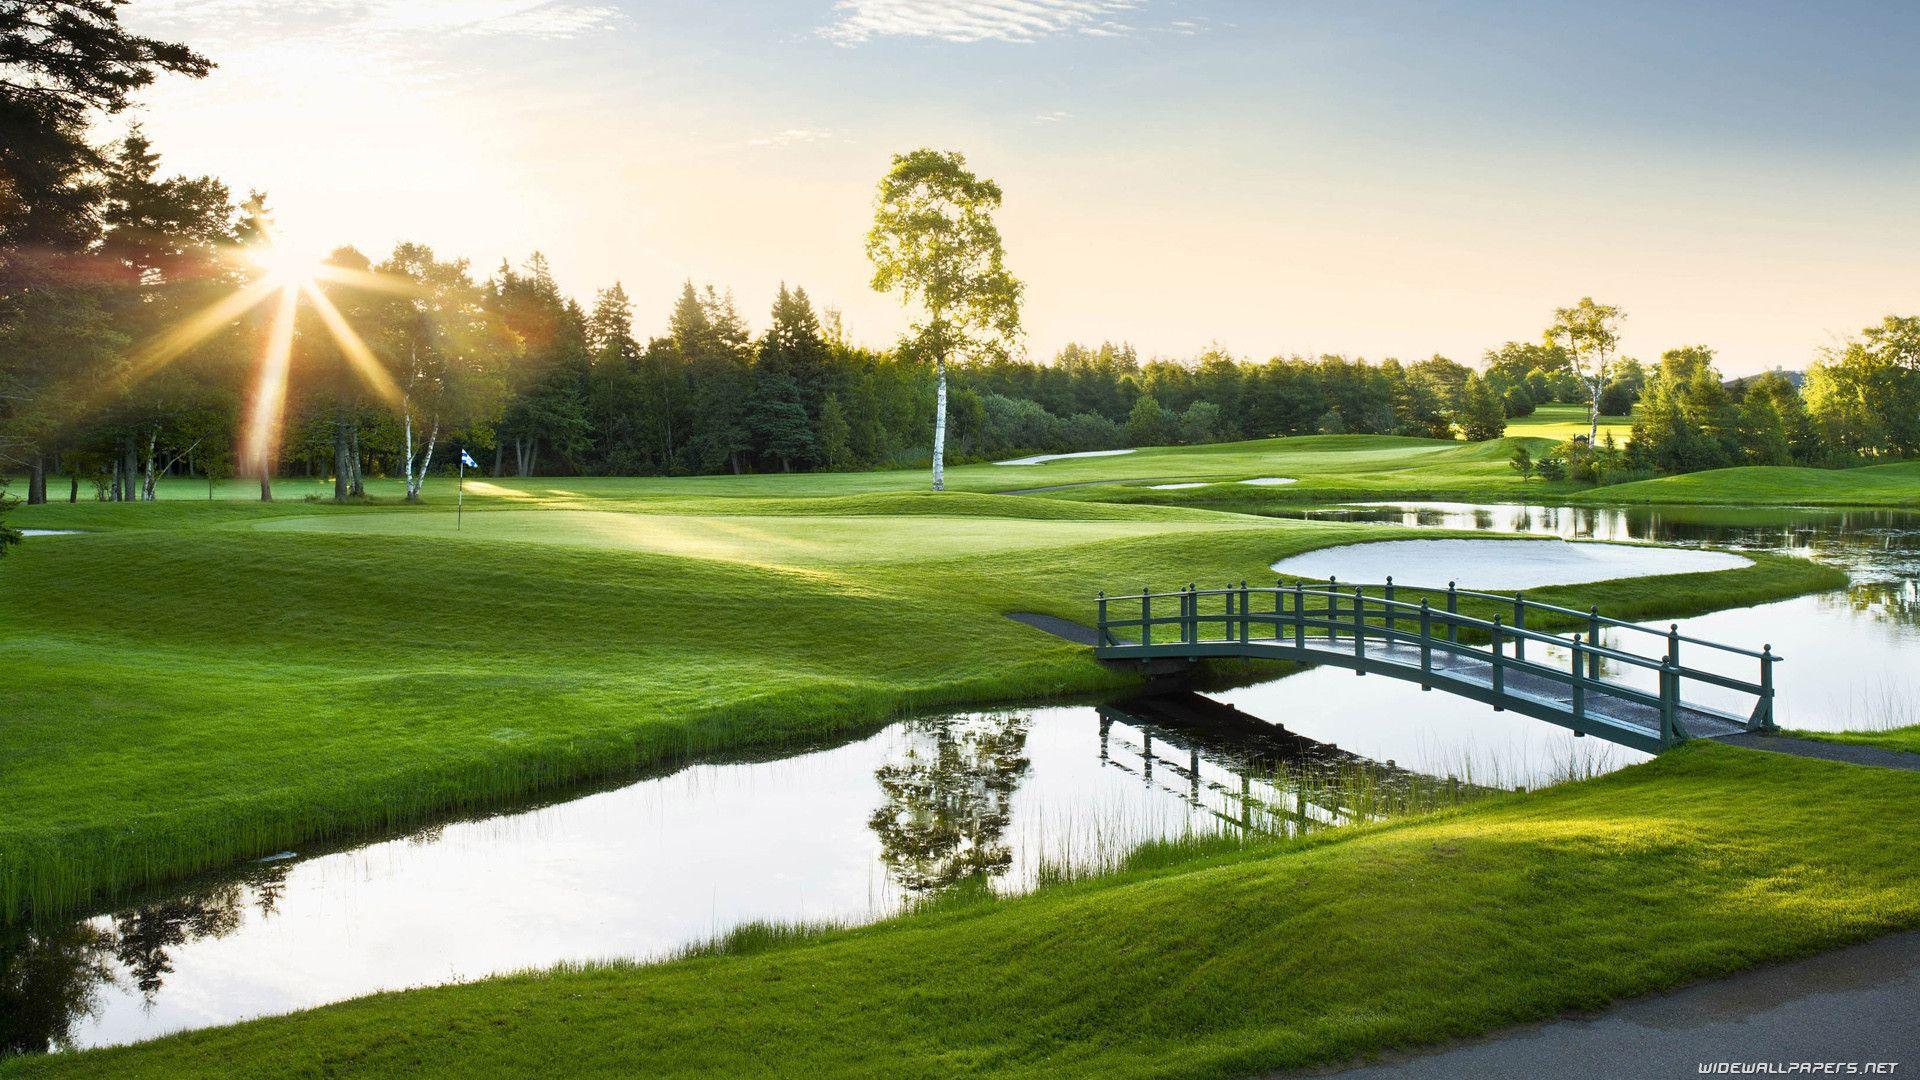 Hd Golf Backgrounds Https Wallpapersko Com Hd Golf Backgrounds Html Backgrounds Hd Wallpapers Download In 2021 Golf School Golf Photography Golf